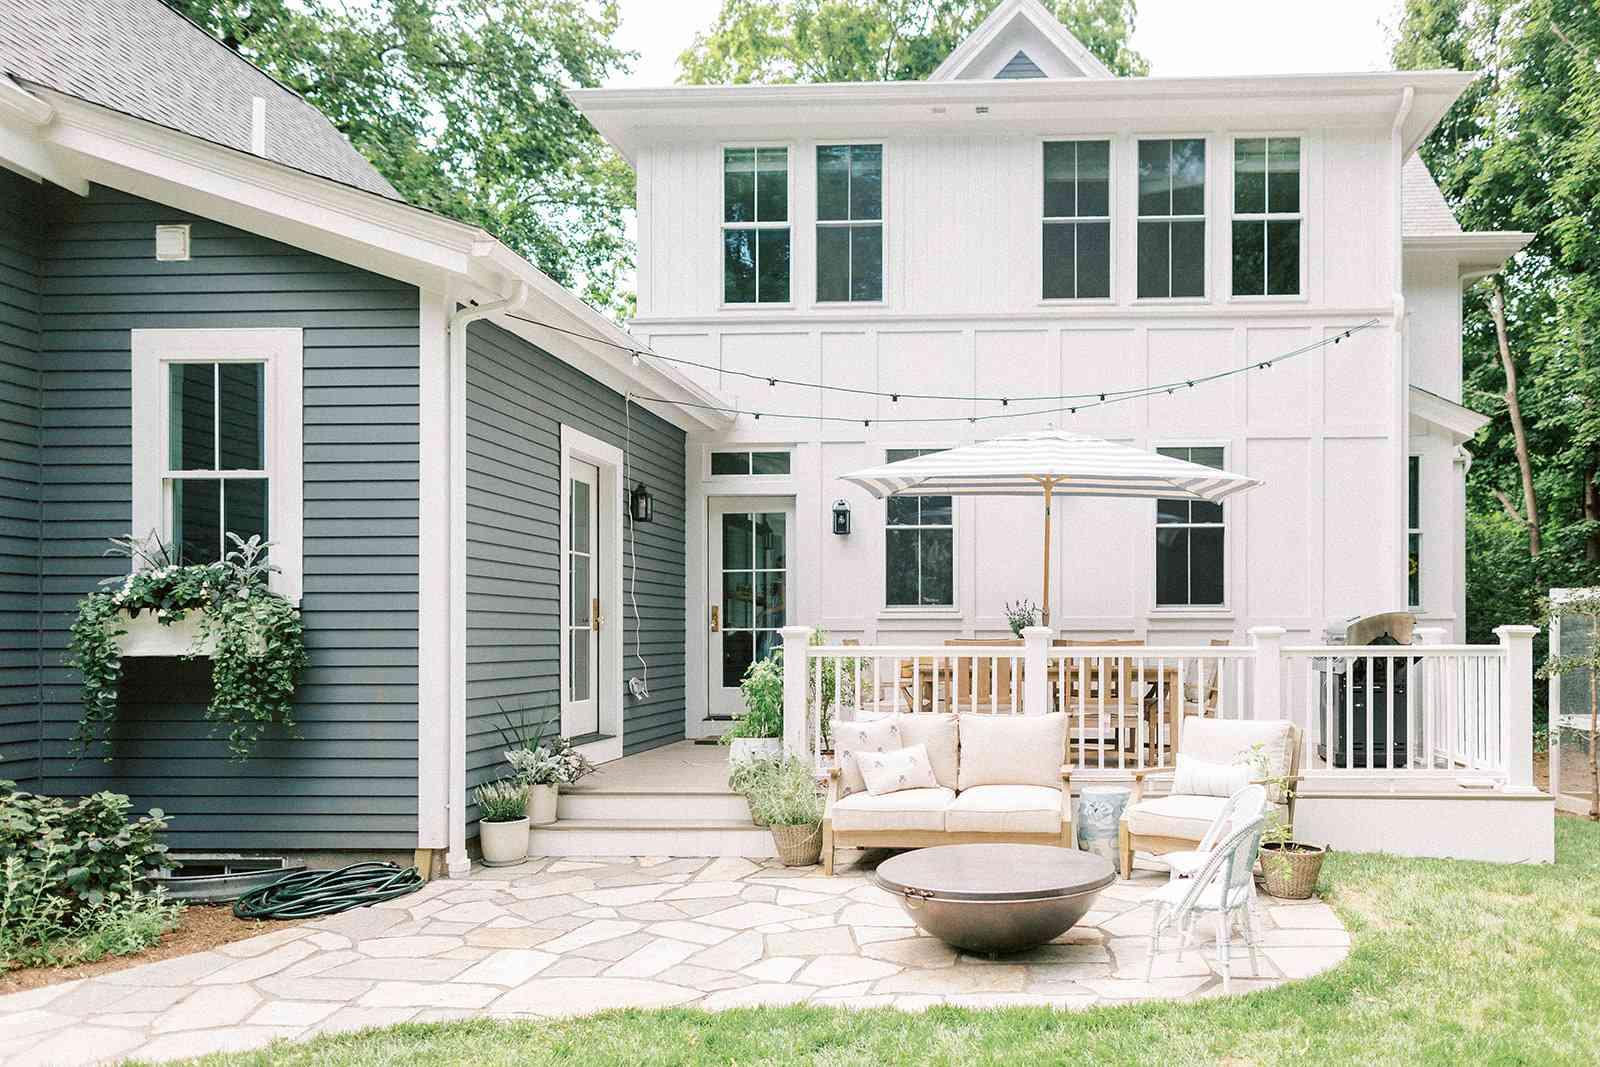 outdoor patio extension of deck